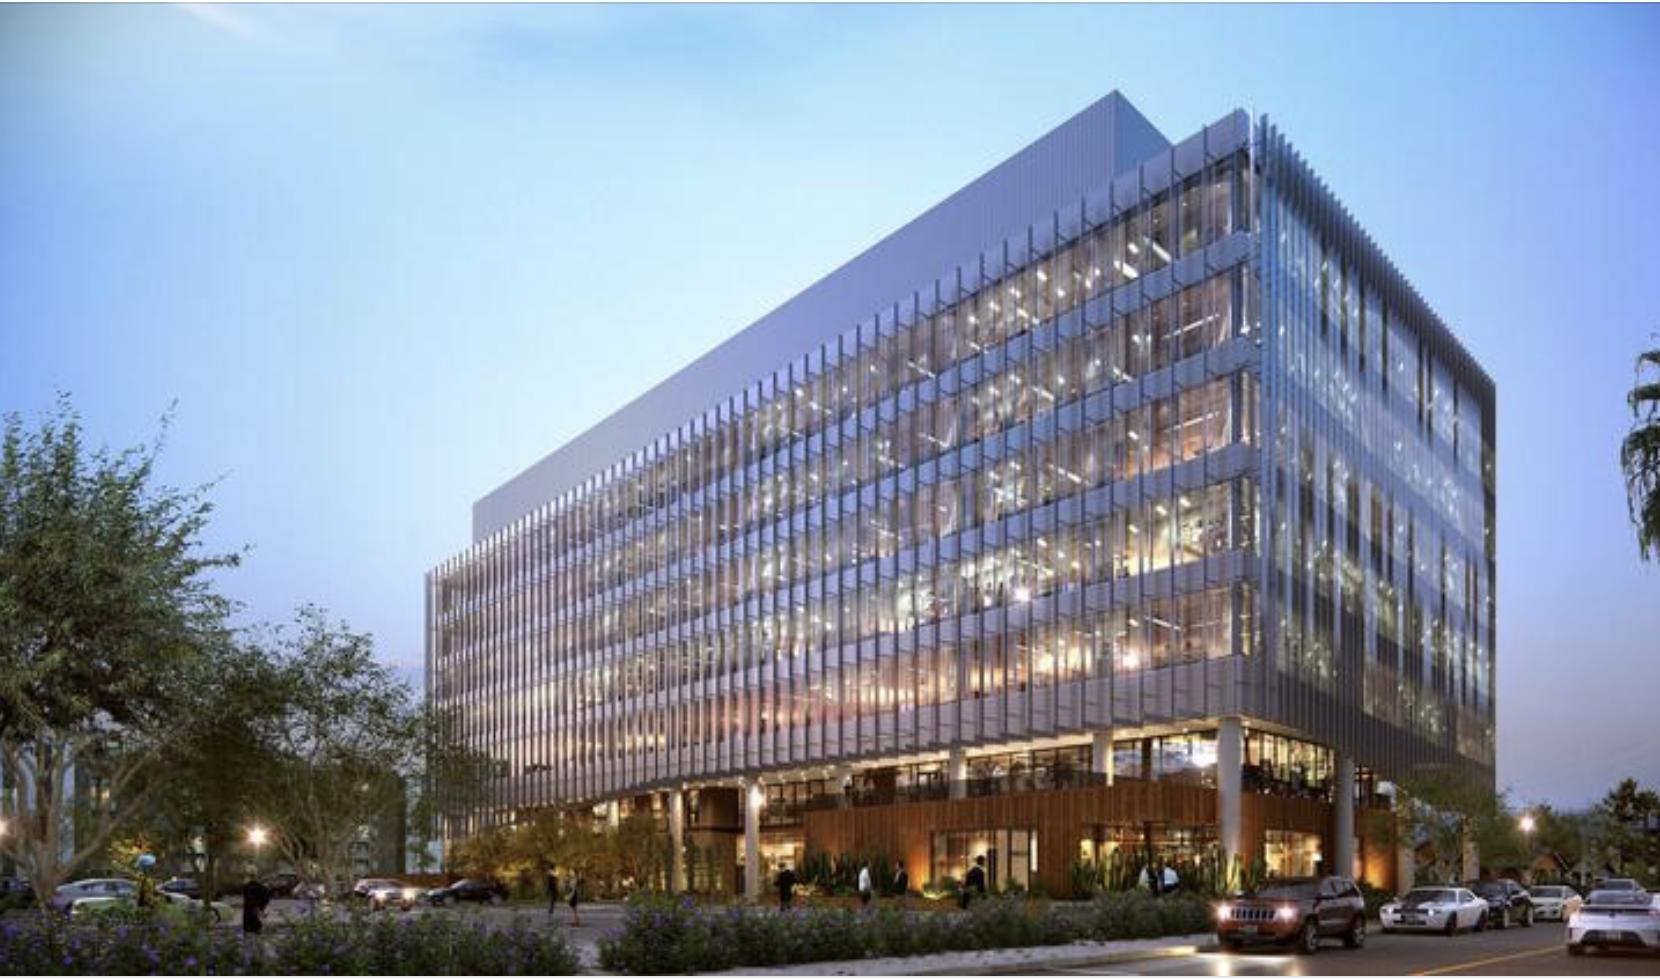 Phoenix embarks on $3B bioscience capital projects, creating 7,000 jobs